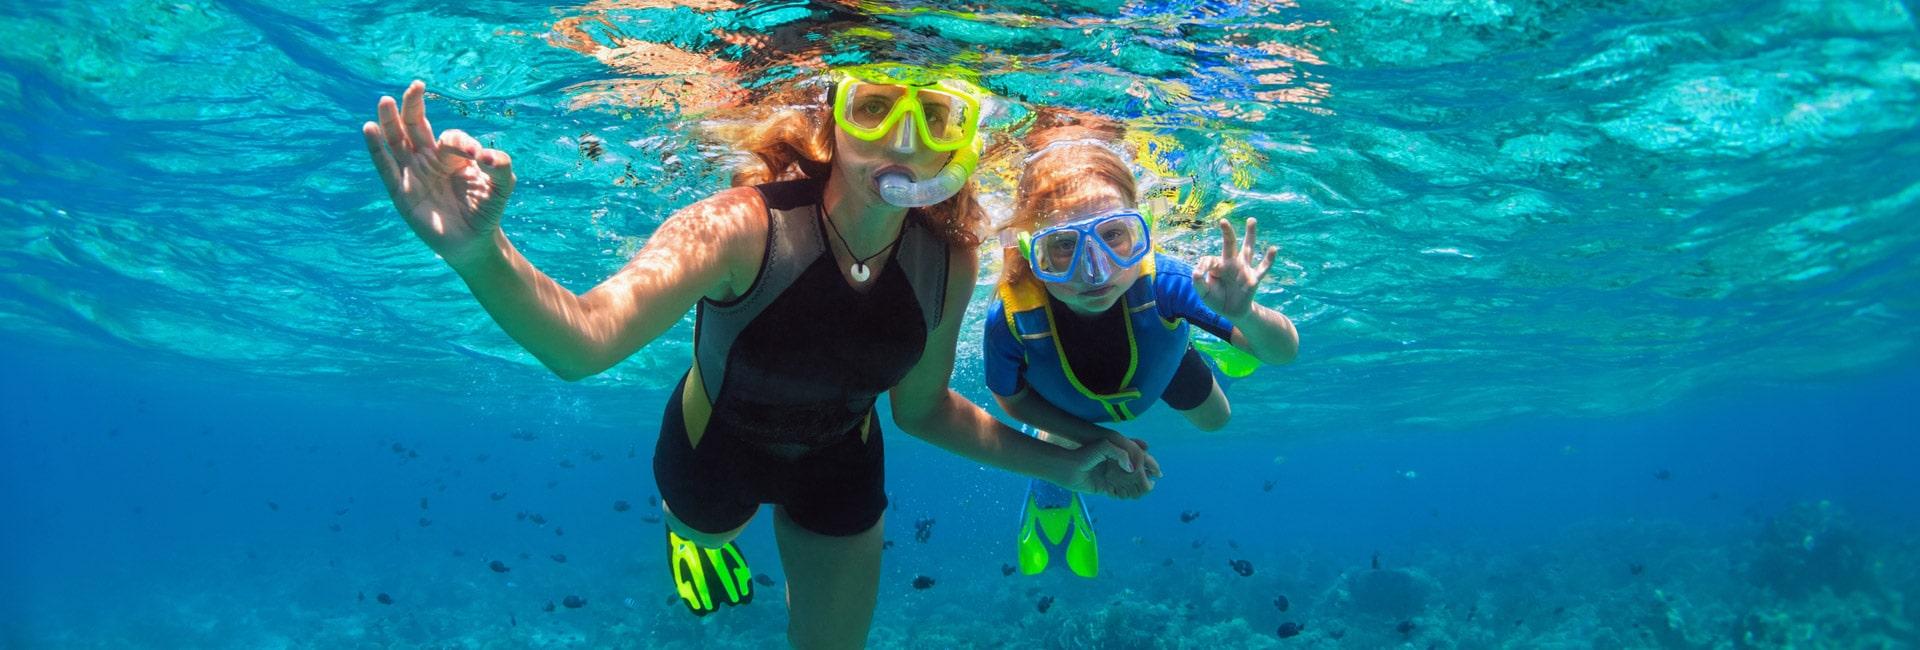 Snorkeling in nuevo vallarta